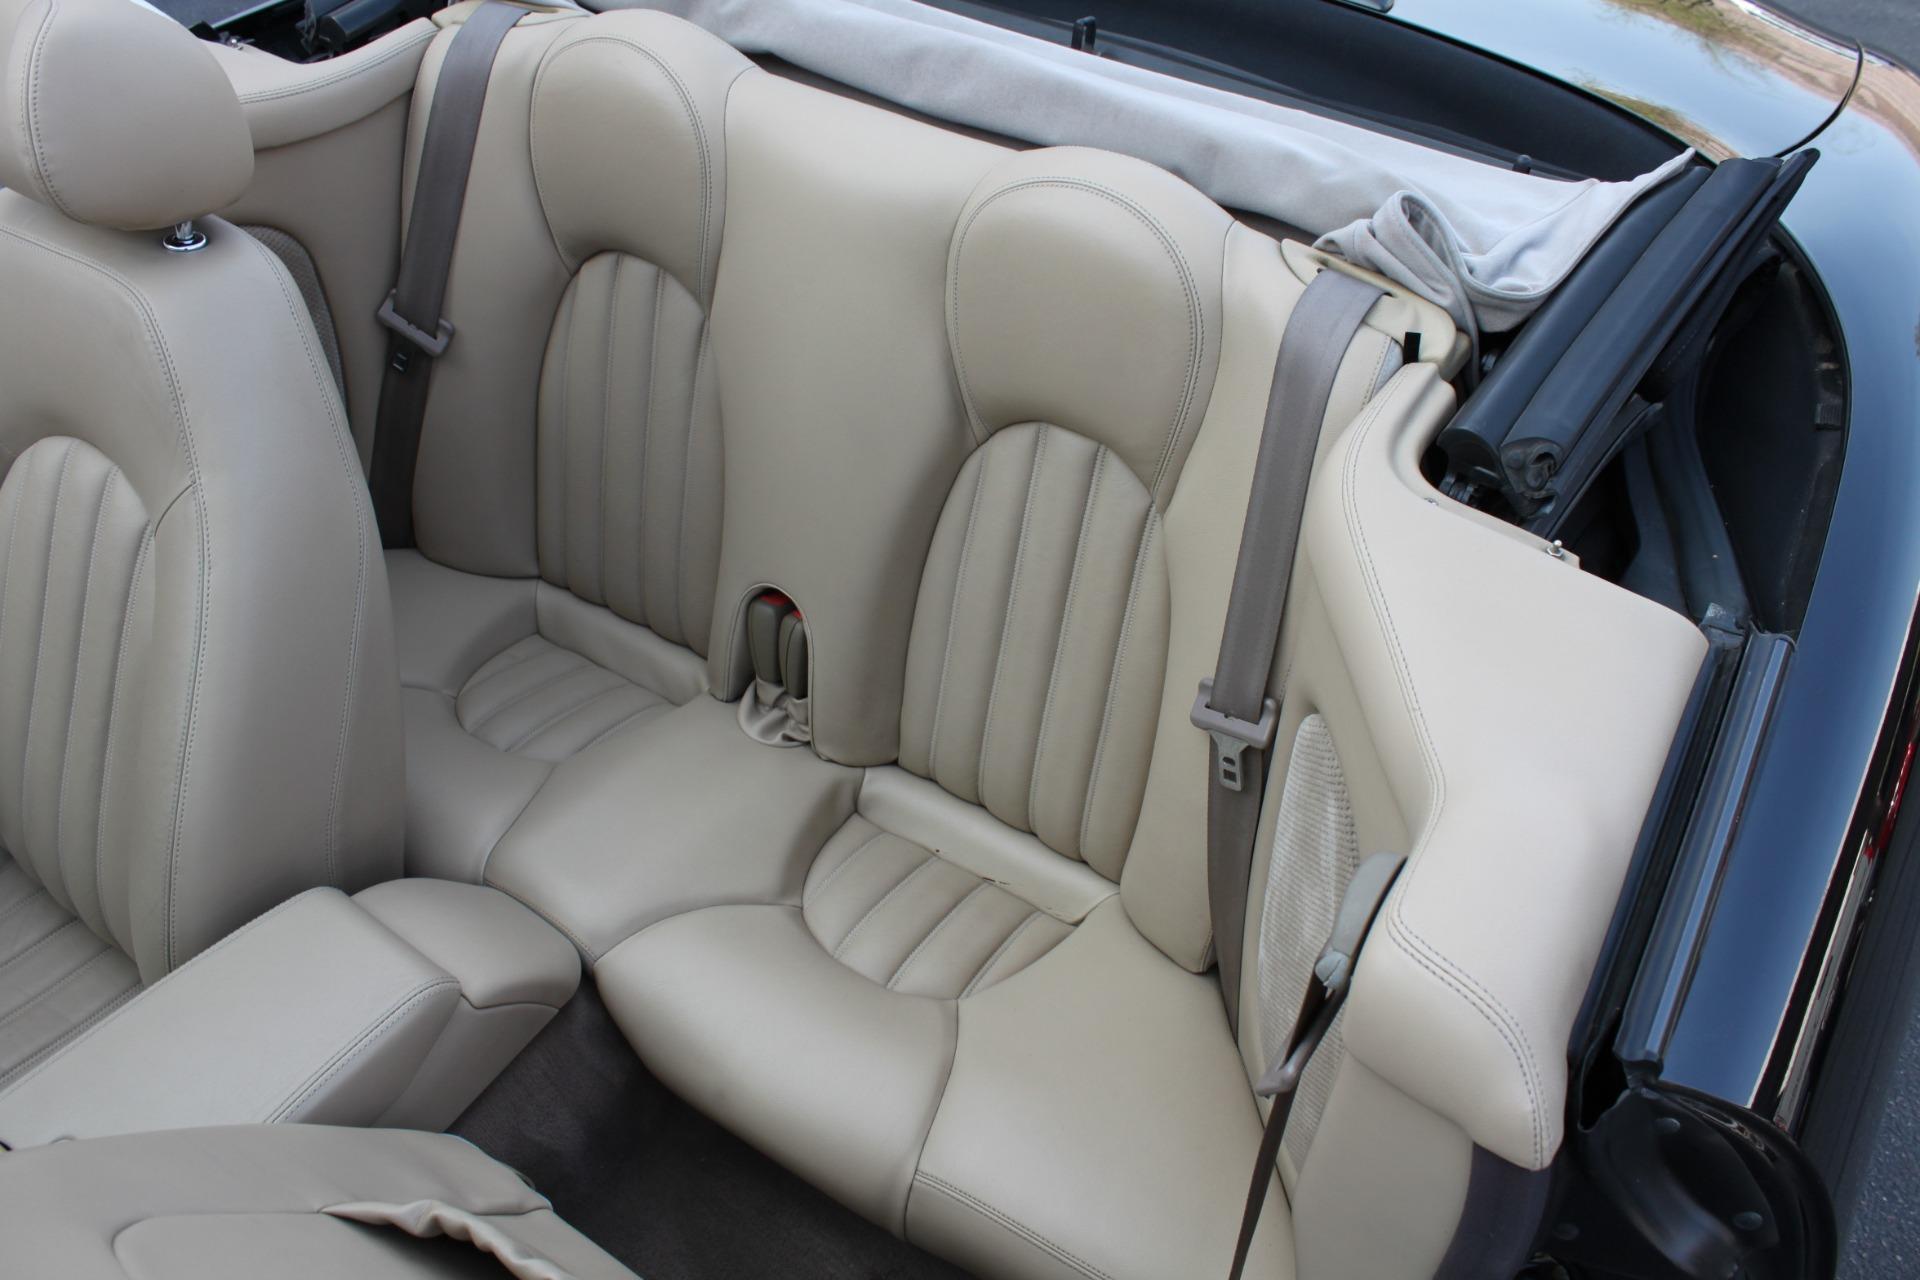 Used-2002-Jaguar-XK8-Convertible-XK8-Mercedes-Benz